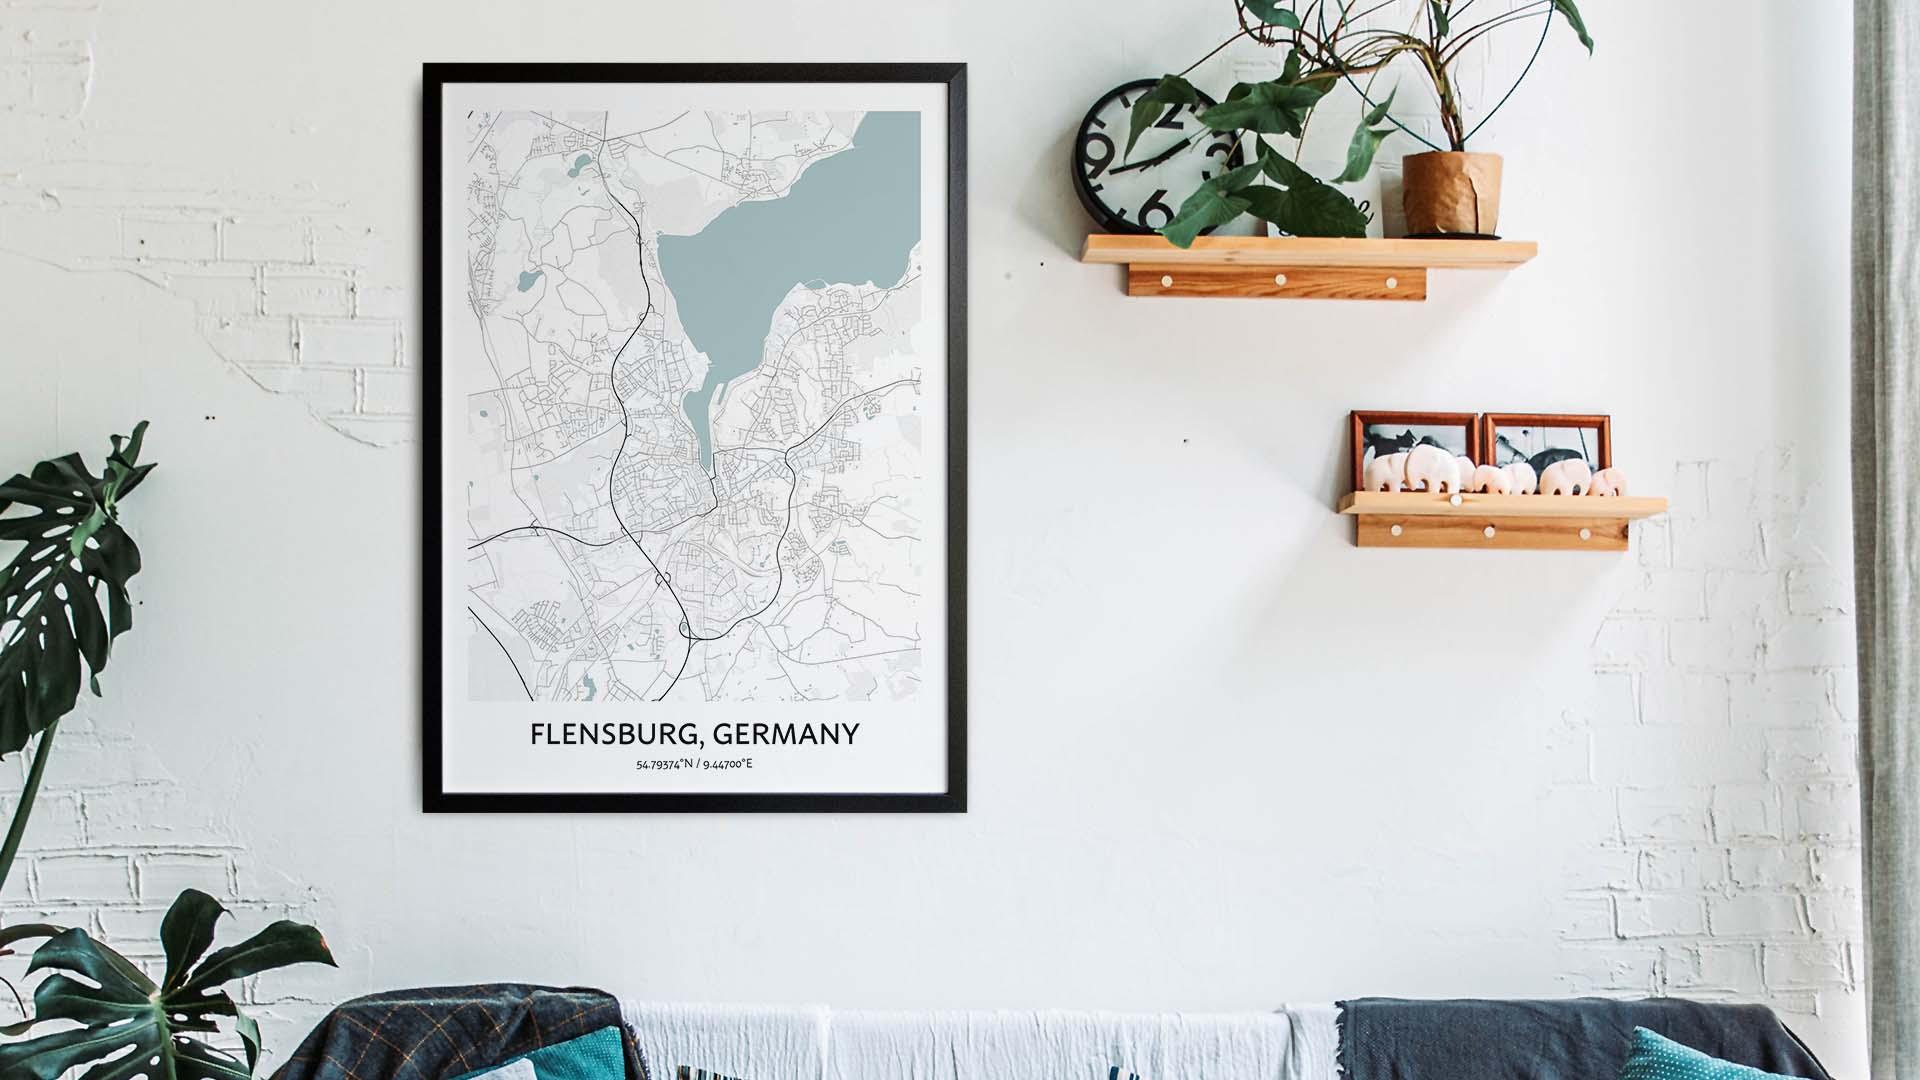 Flensburg map art